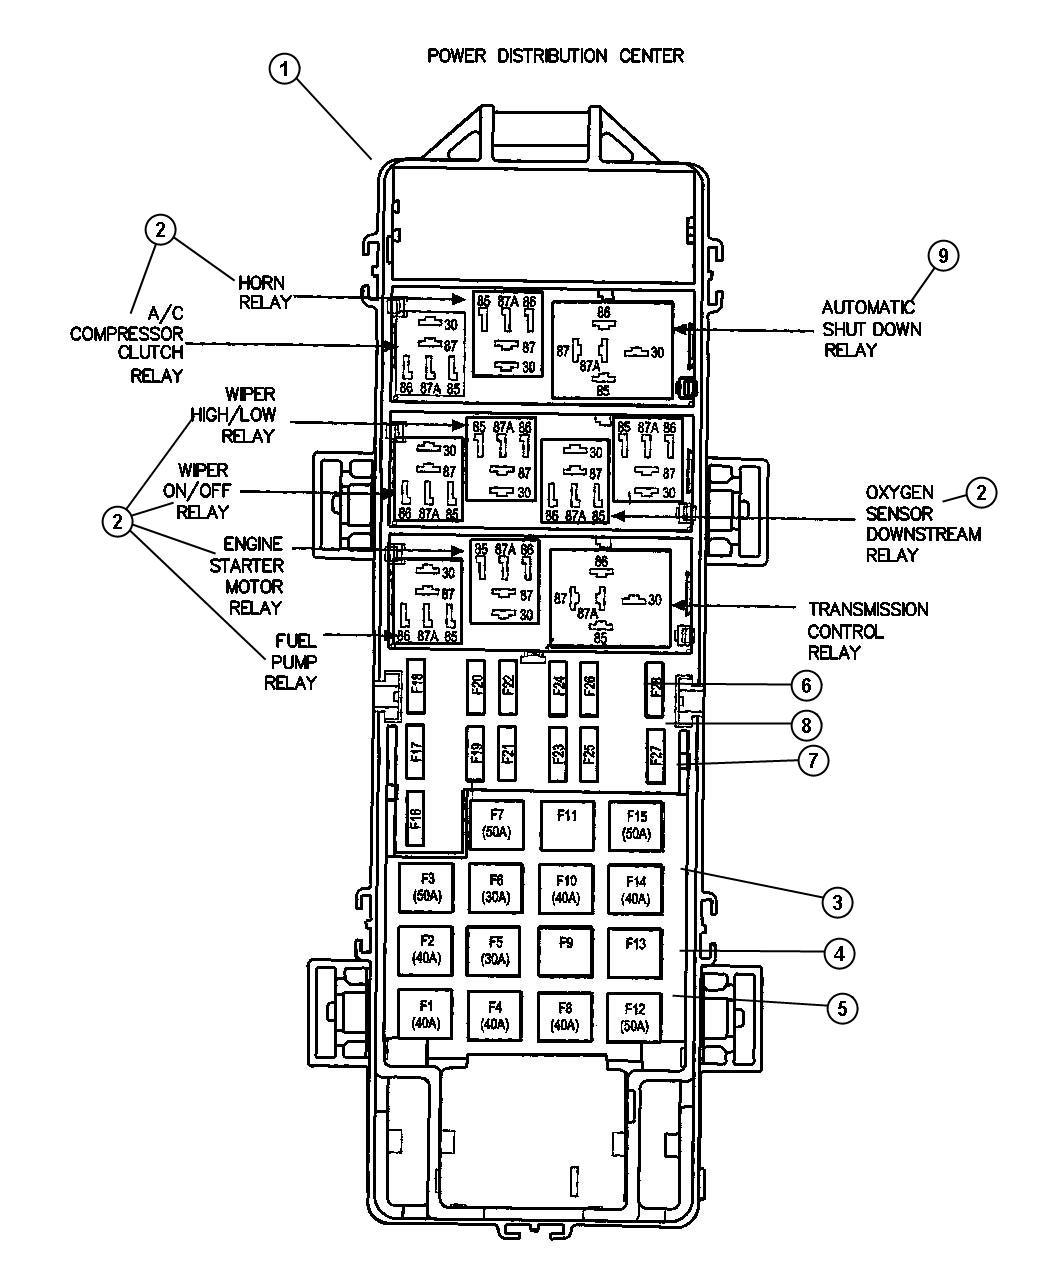 wf 8162 jeep cherokee forum together with jeep grand cherokee fuse box diagram free diagram mopar synk kicep usnes icaen cosm bepta isra mohammedshrine librar wiring 101